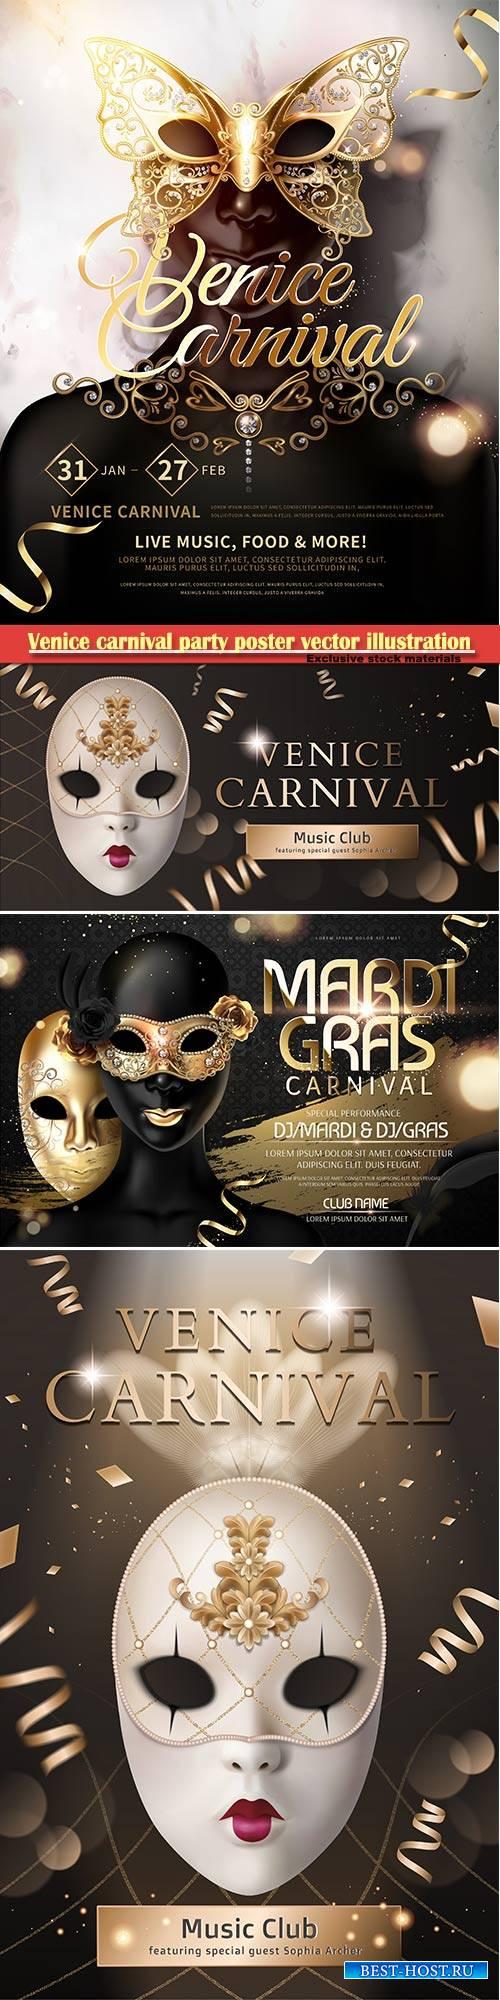 Venice carnival design vector illustration, Mardi gras # 3